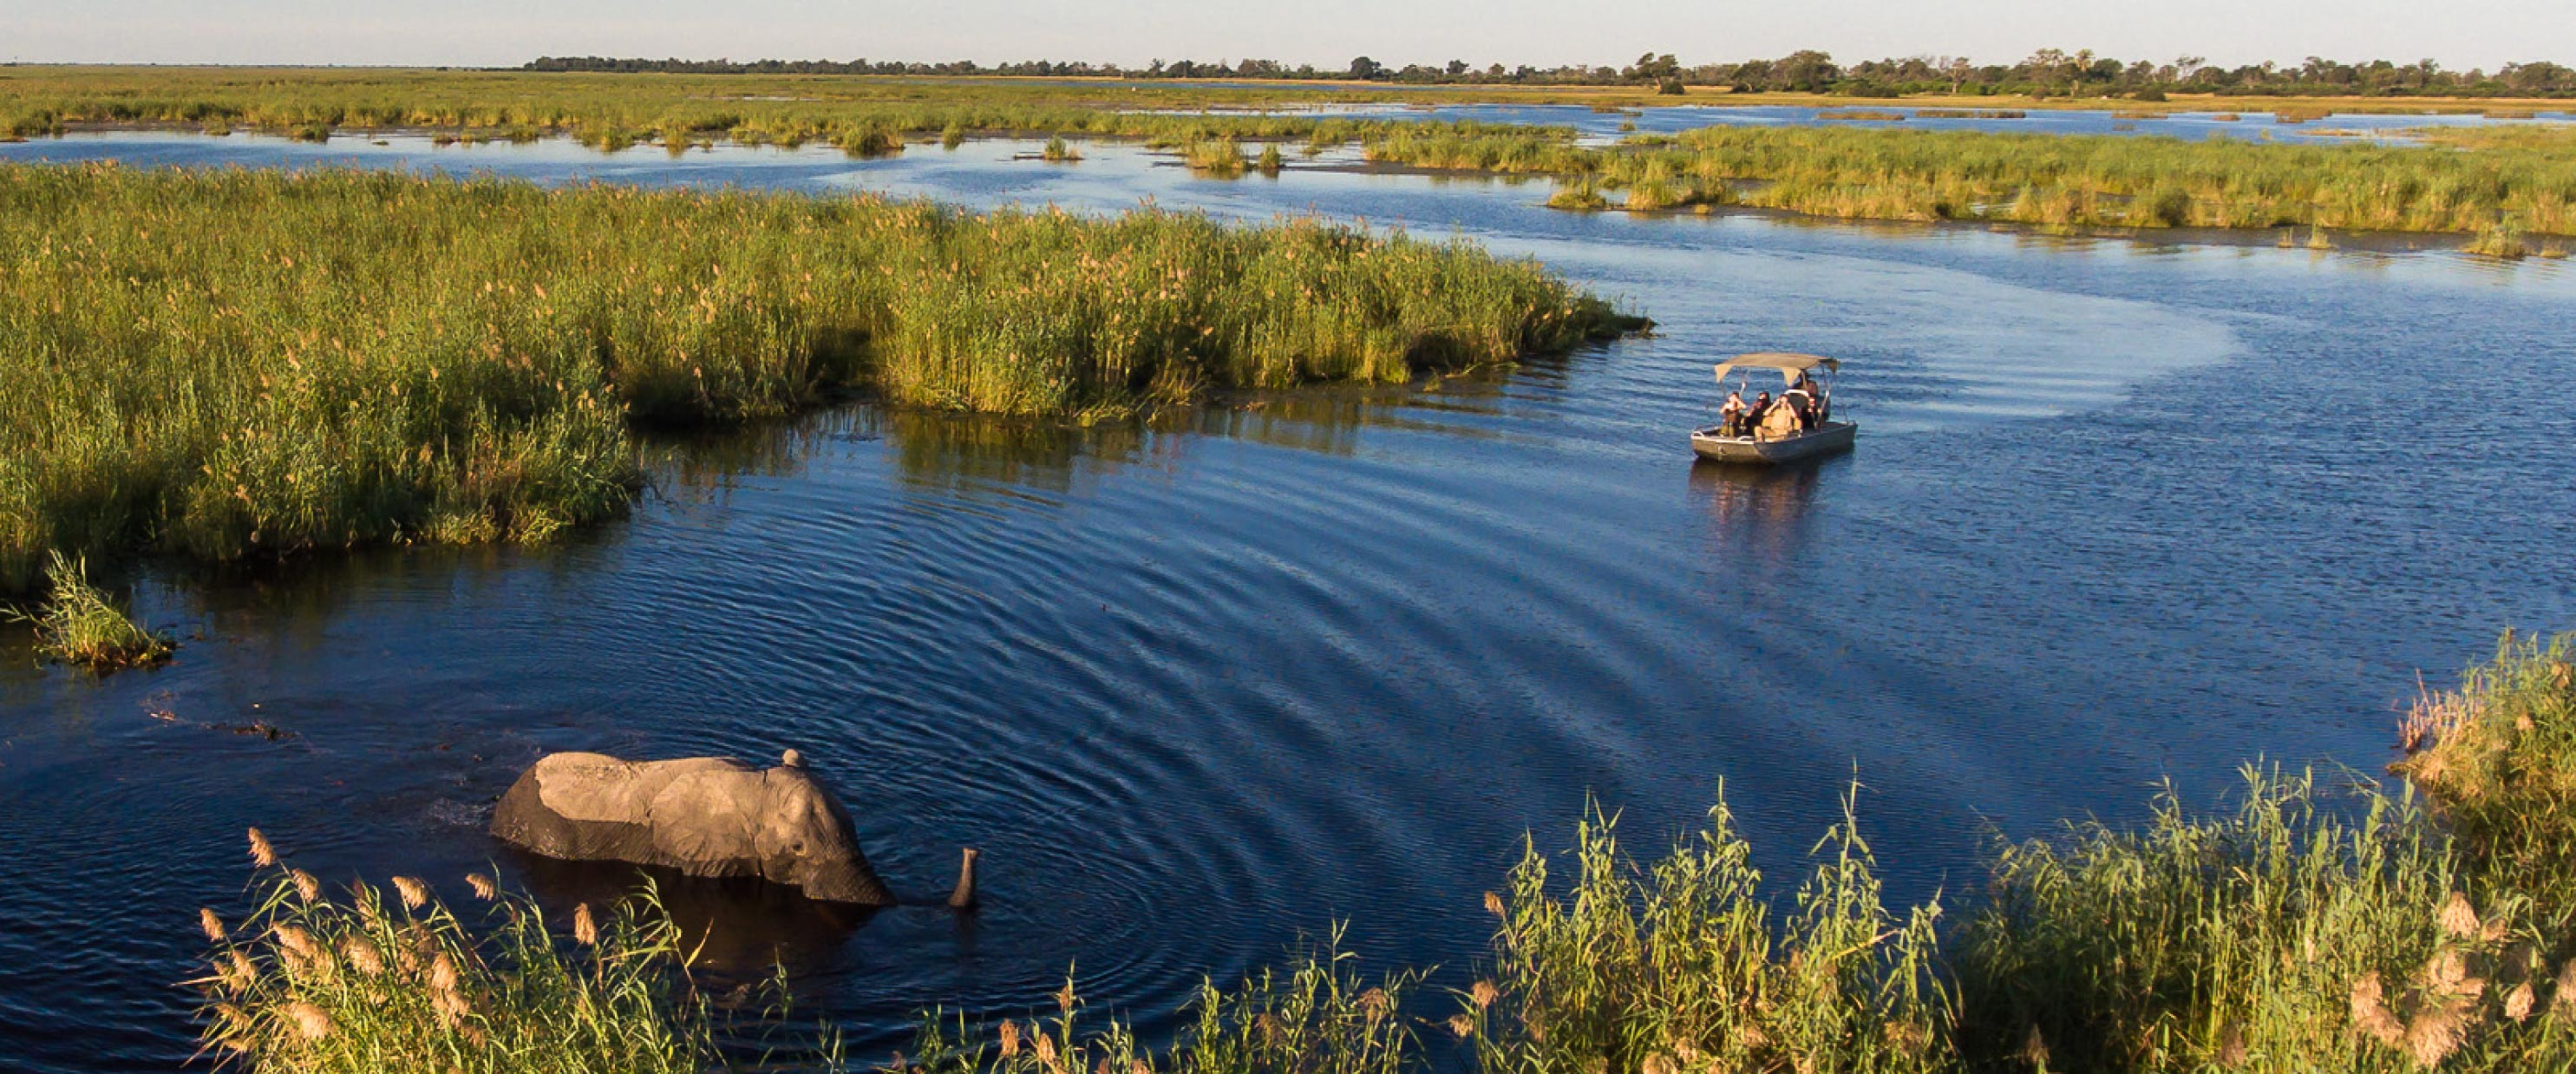 ADORE Africa Safari Guide